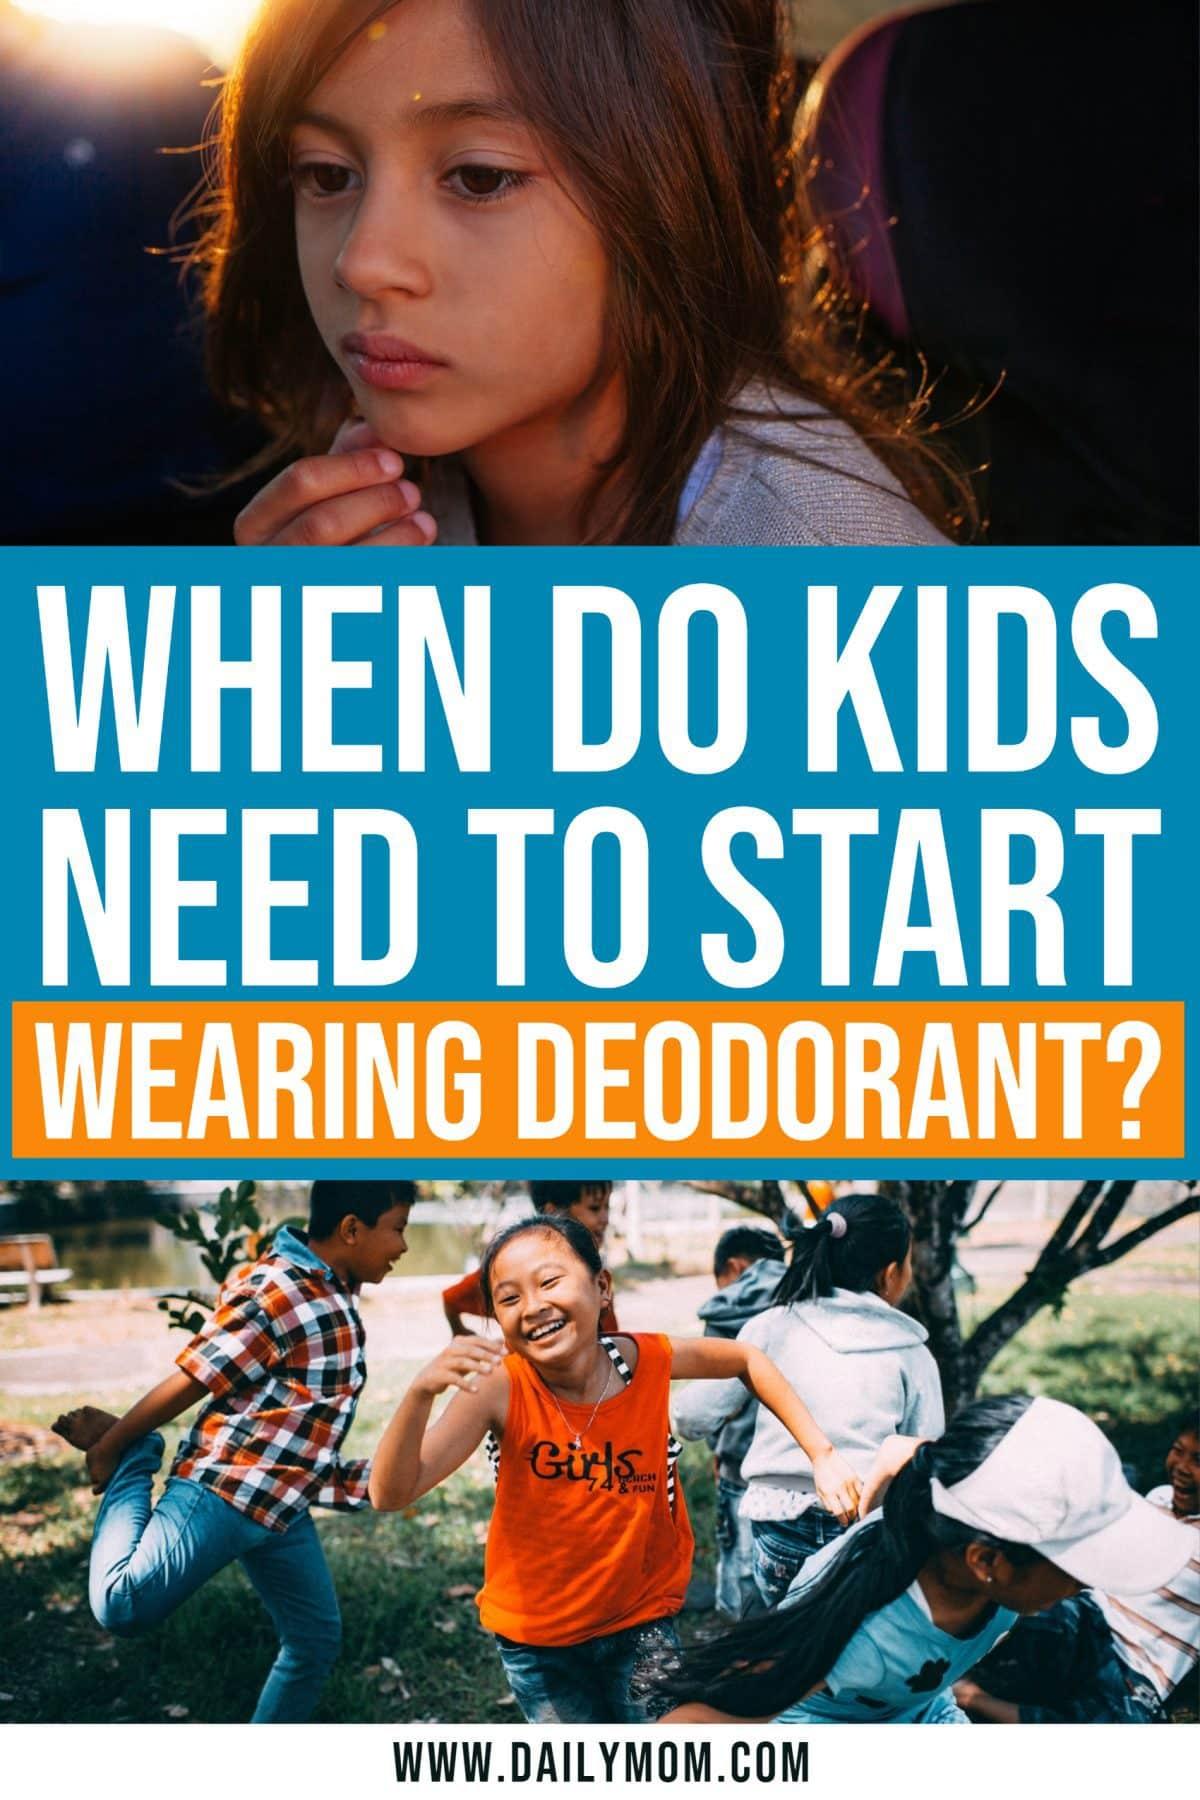 Kids And Deodorant